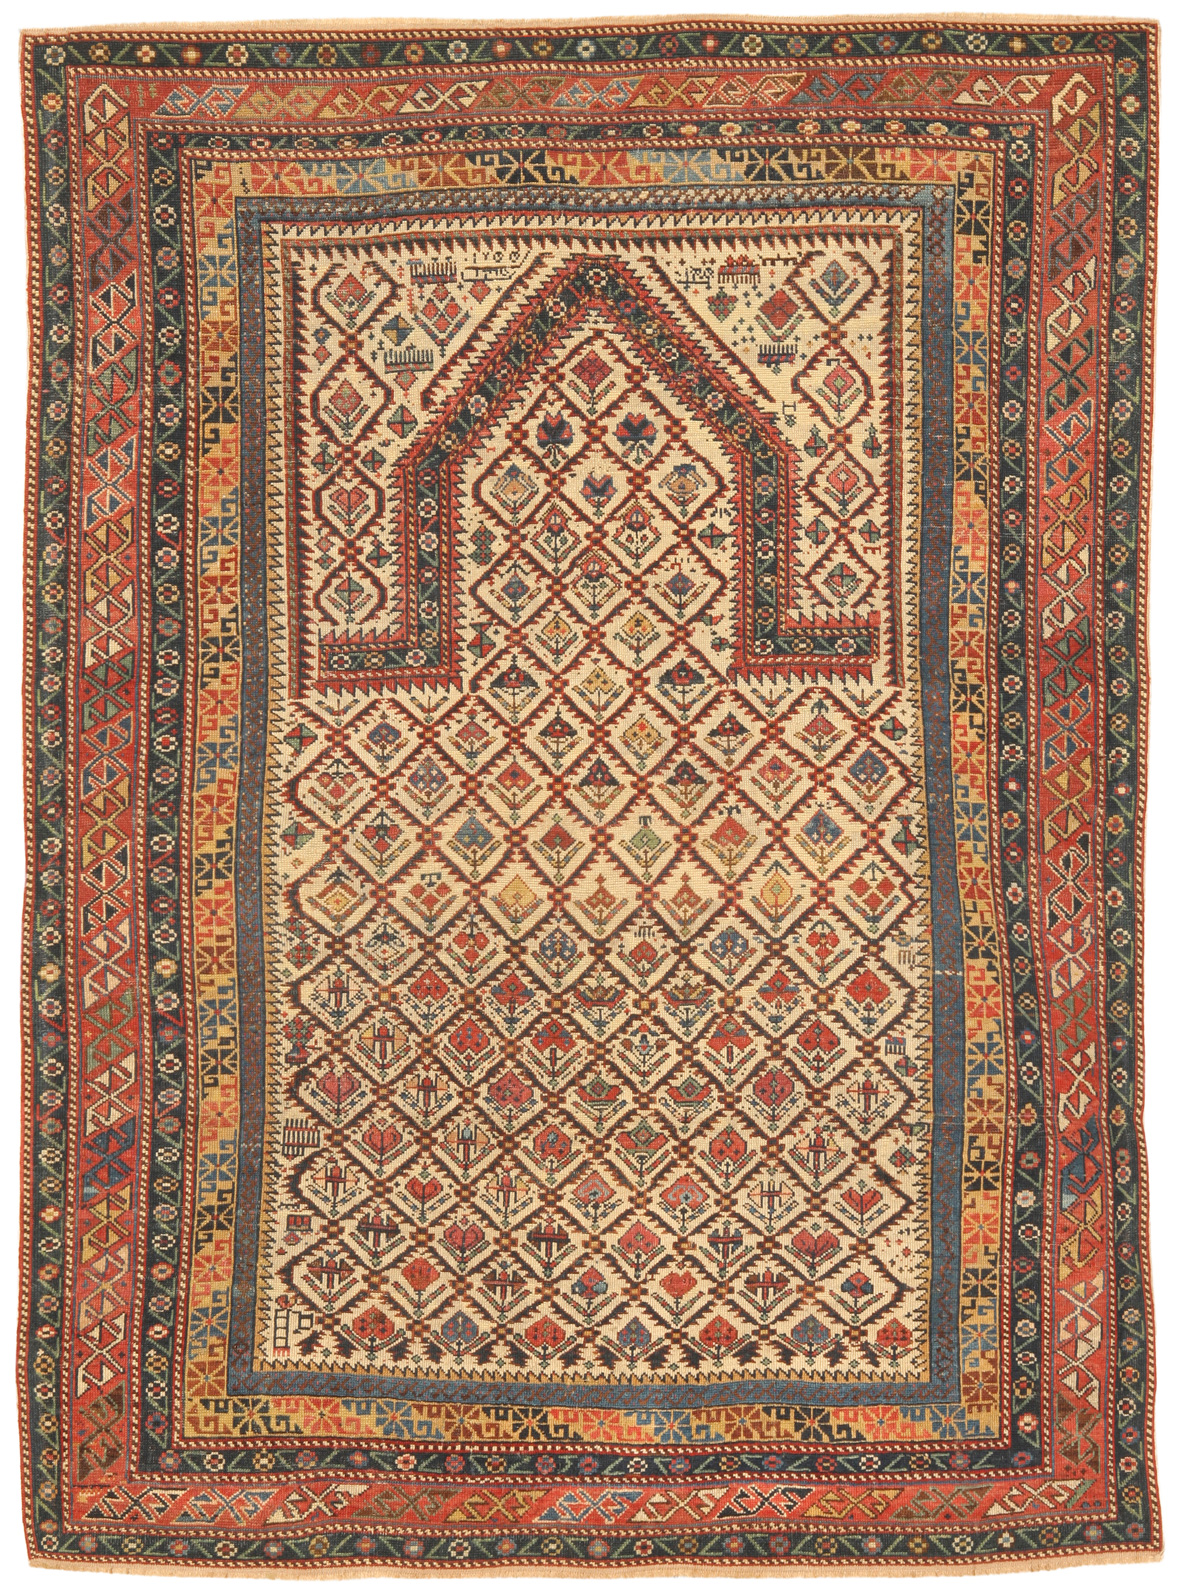 Antique Caucasian Shirvan Rug Antique Zili Sultan Rug Tekke Rug